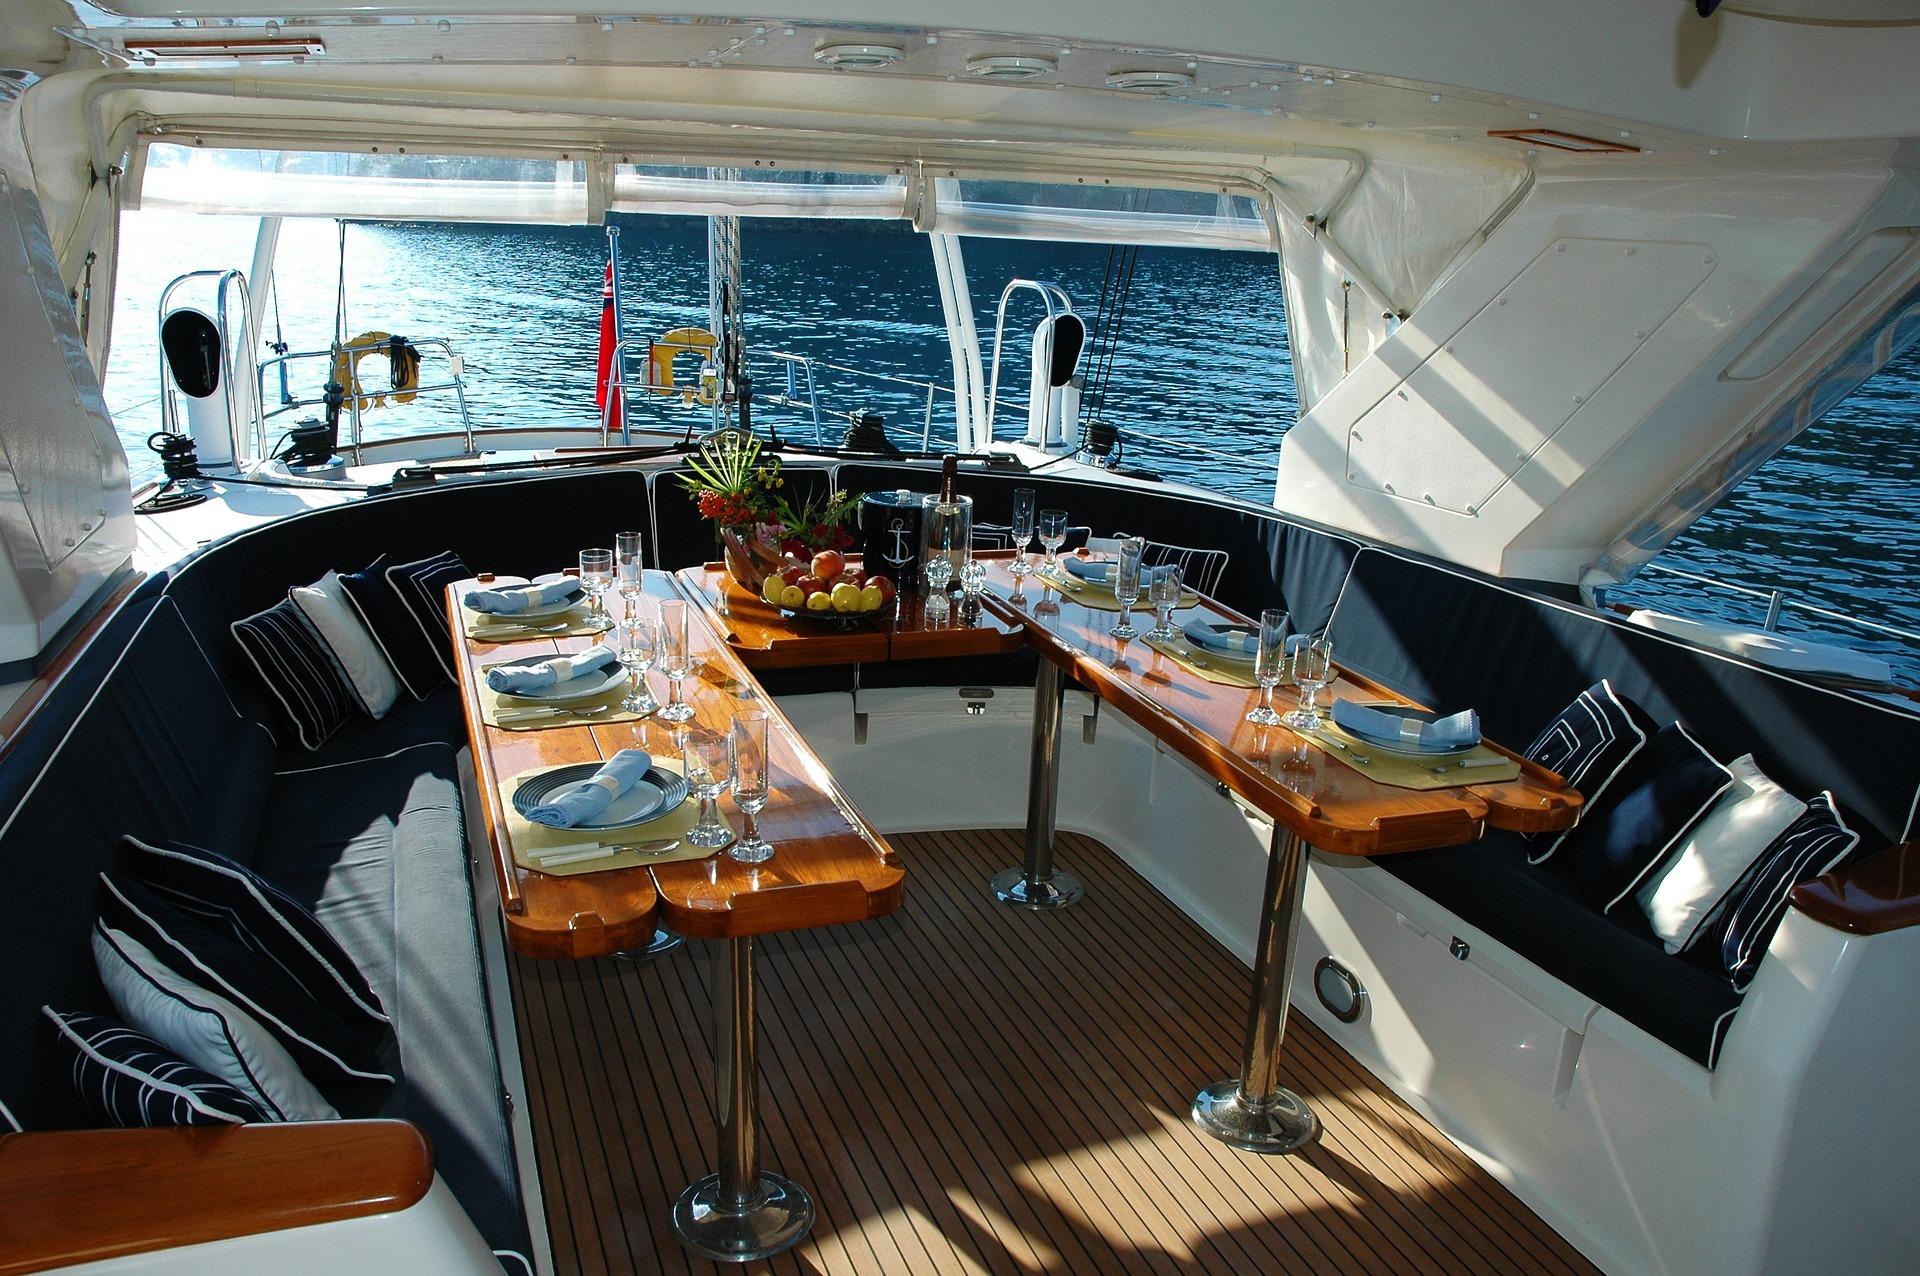 yacht-1258972_1920.jpg